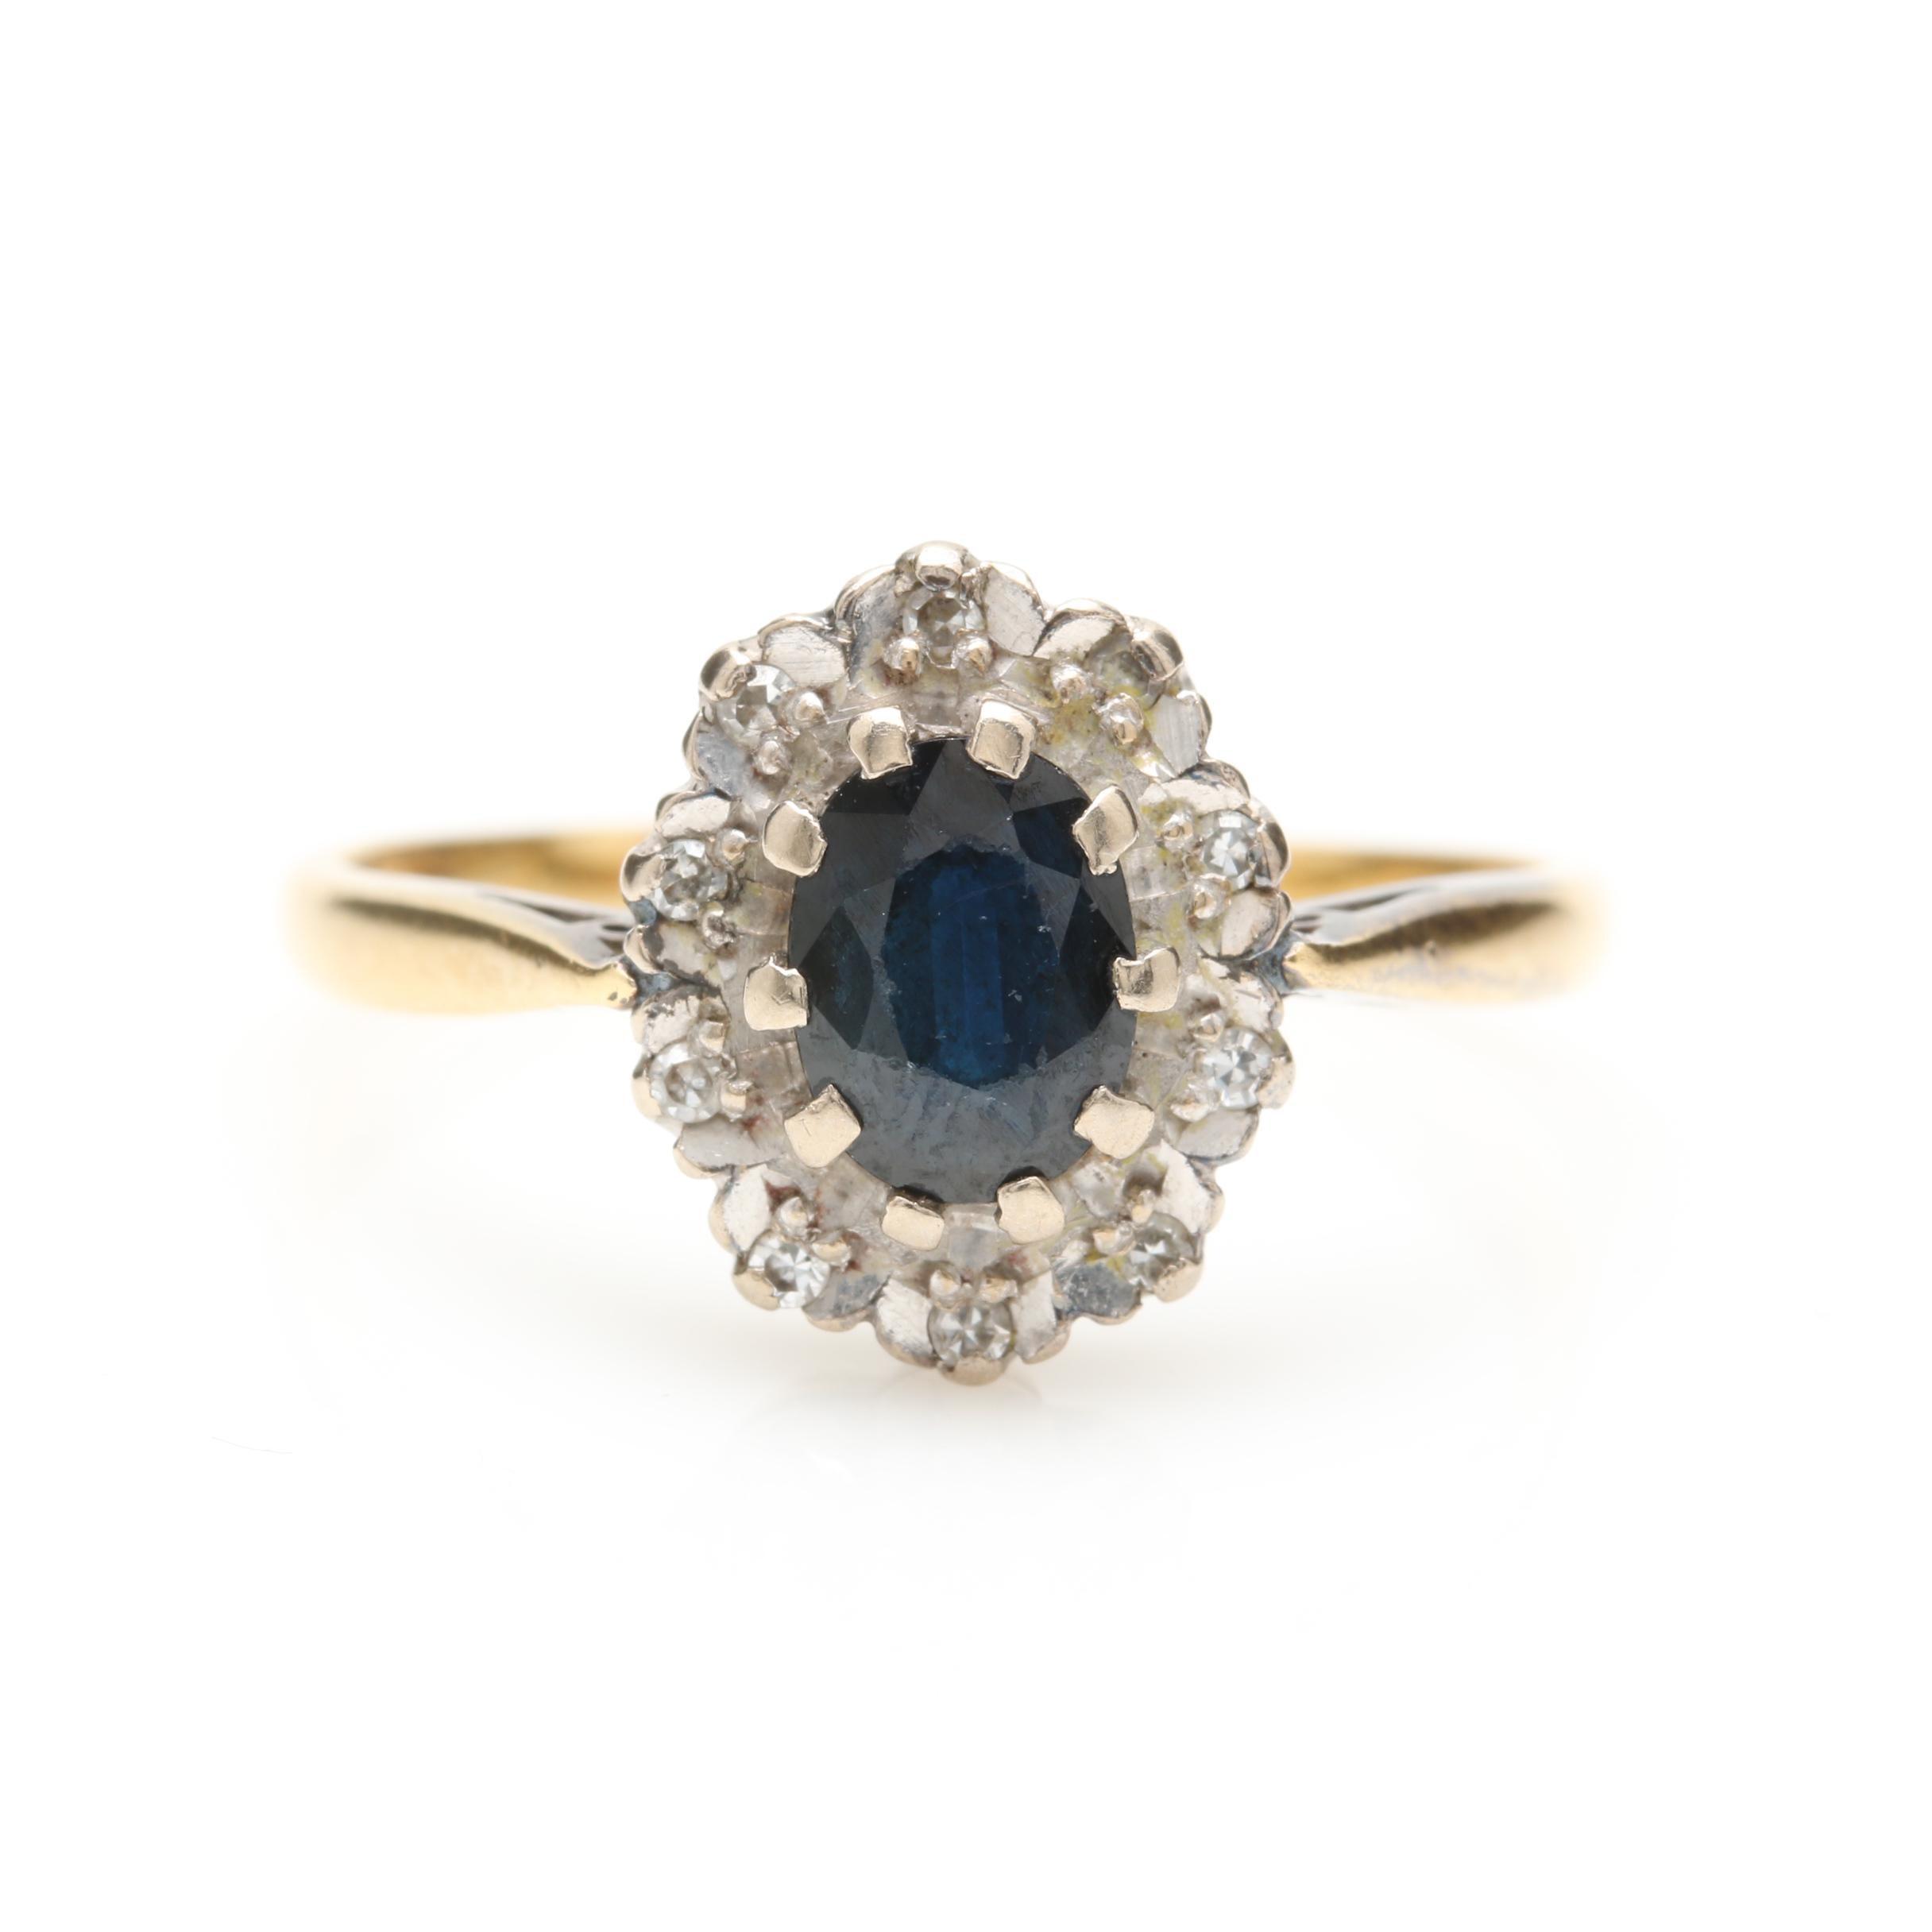 Circa 1976 18K Yellow Gold Sapphire and Diamond Ring